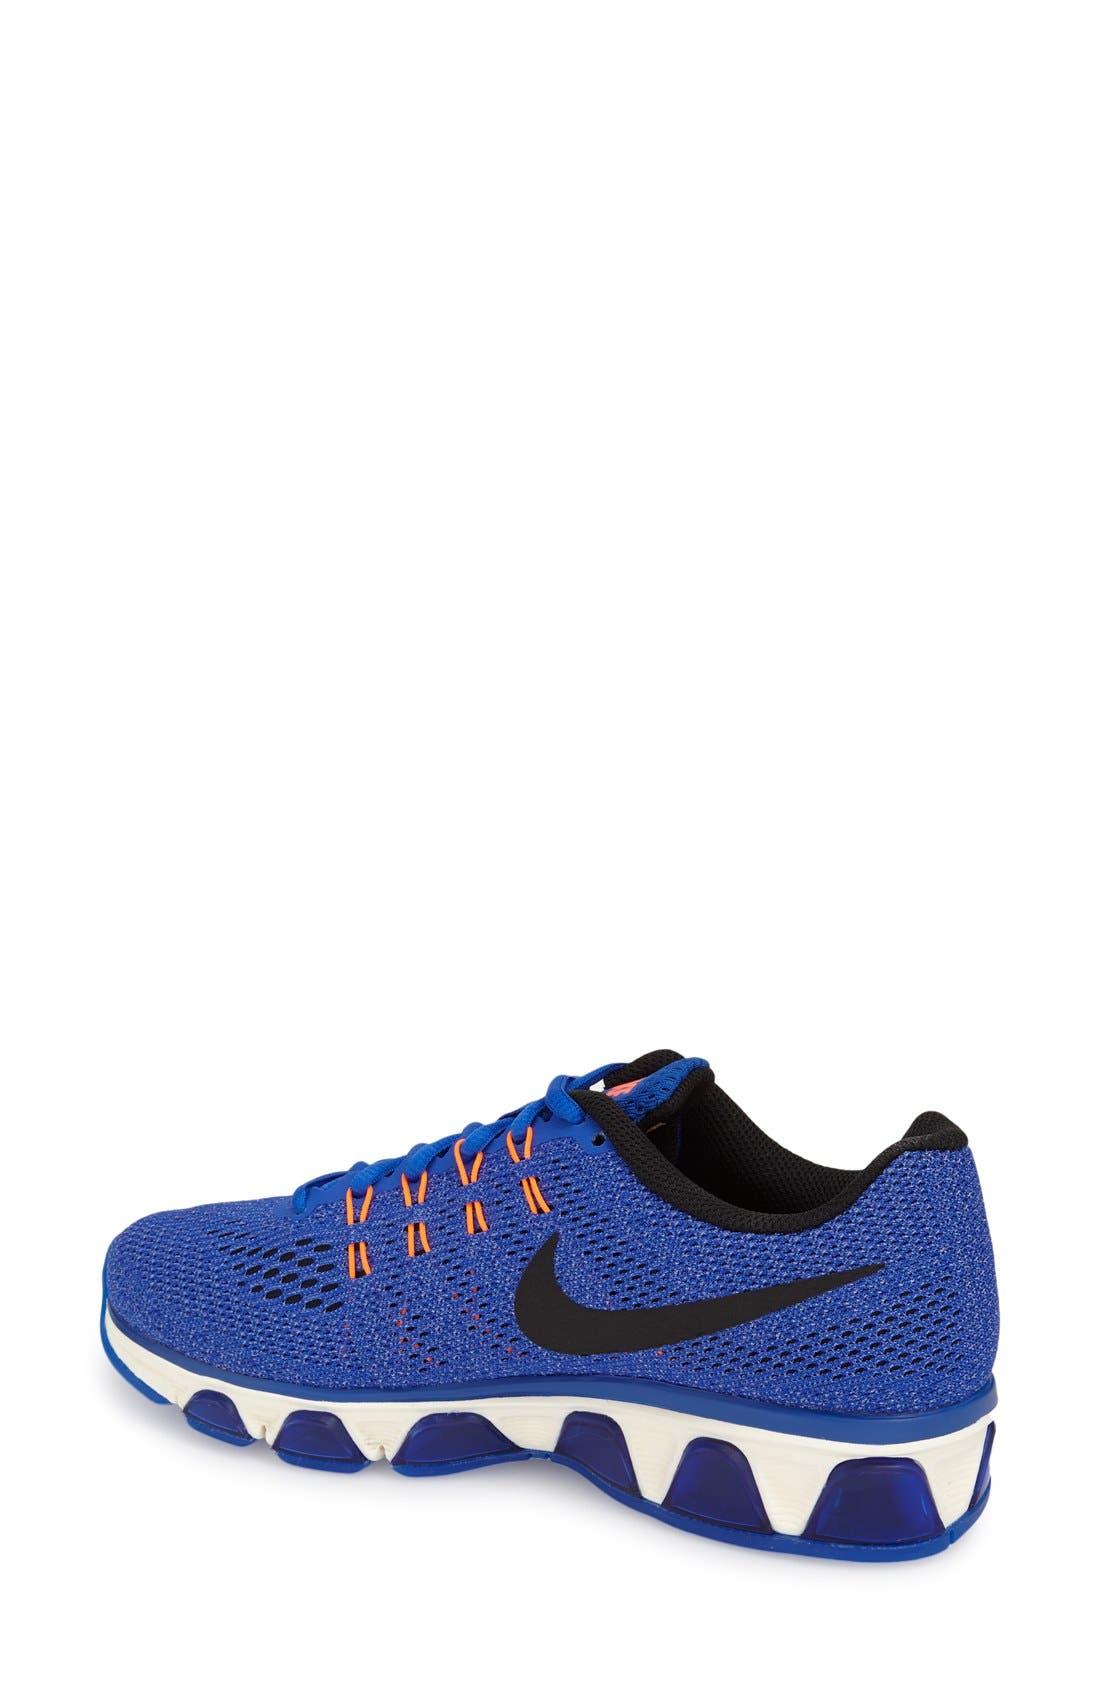 Alternate Image 2  - Nike 'Air Max Tailwind 8' Running Shoe (Women)